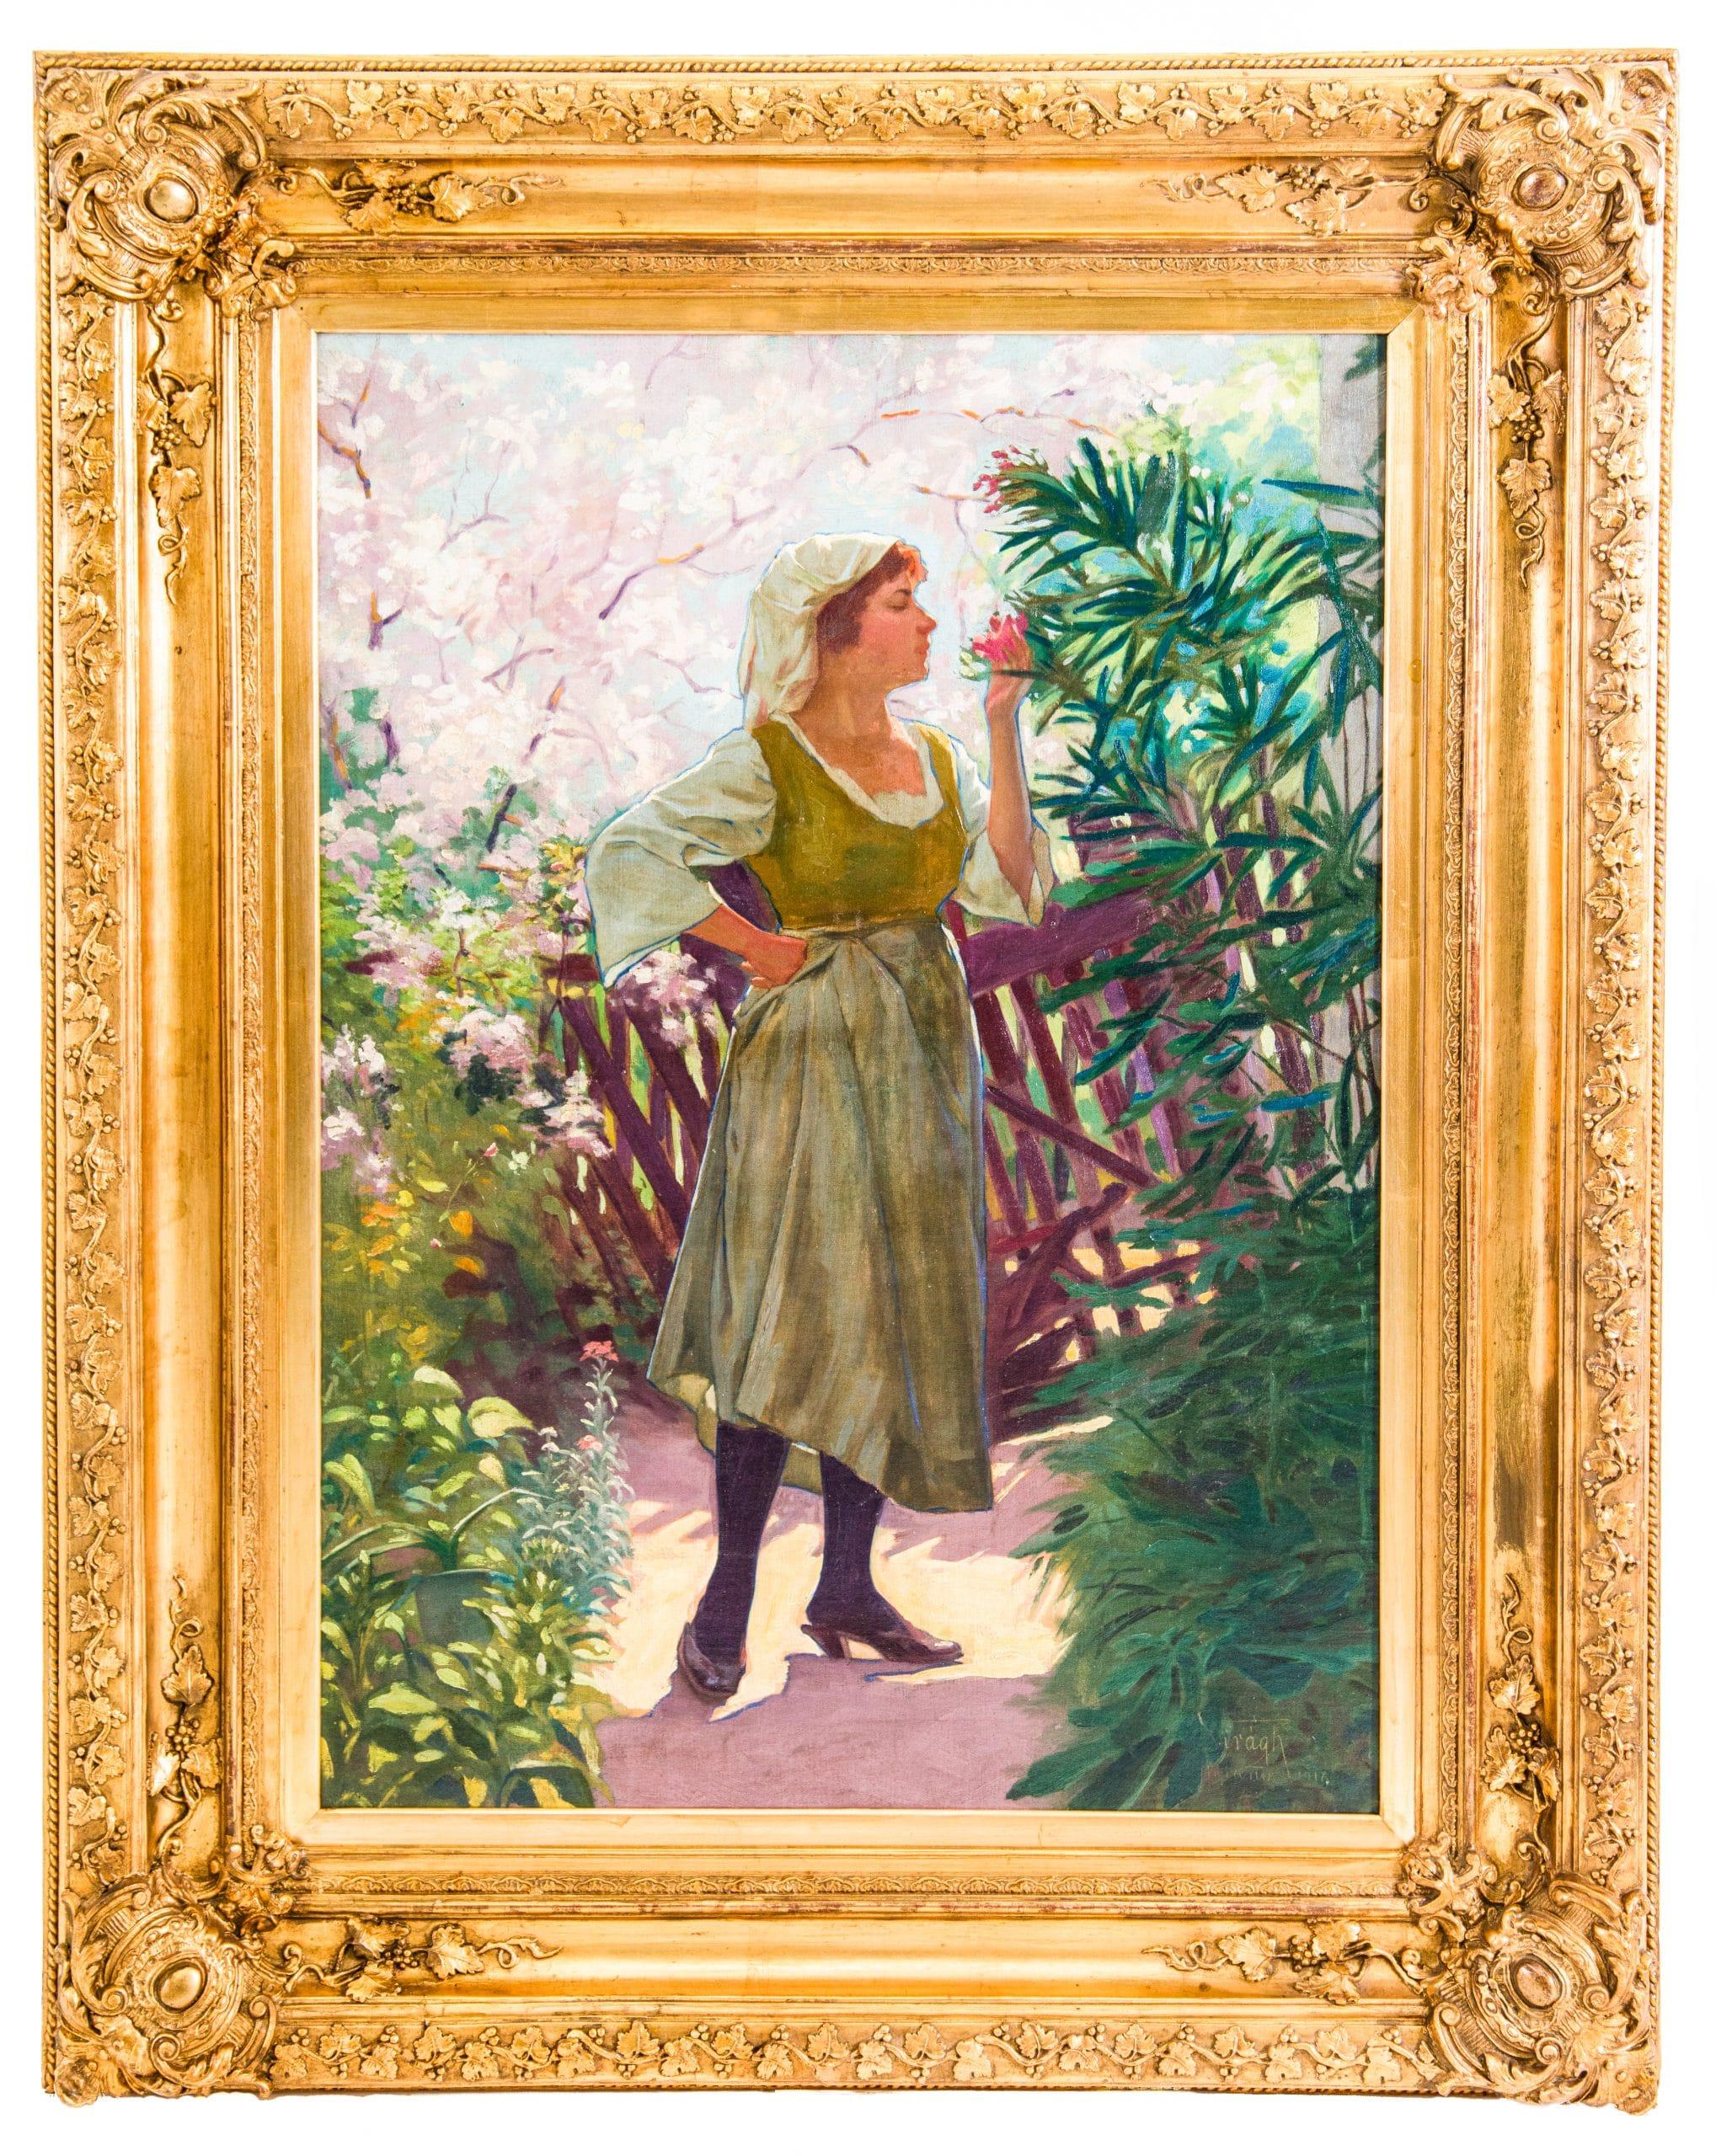 Virágh Gyula: Lány virágok között, 1917